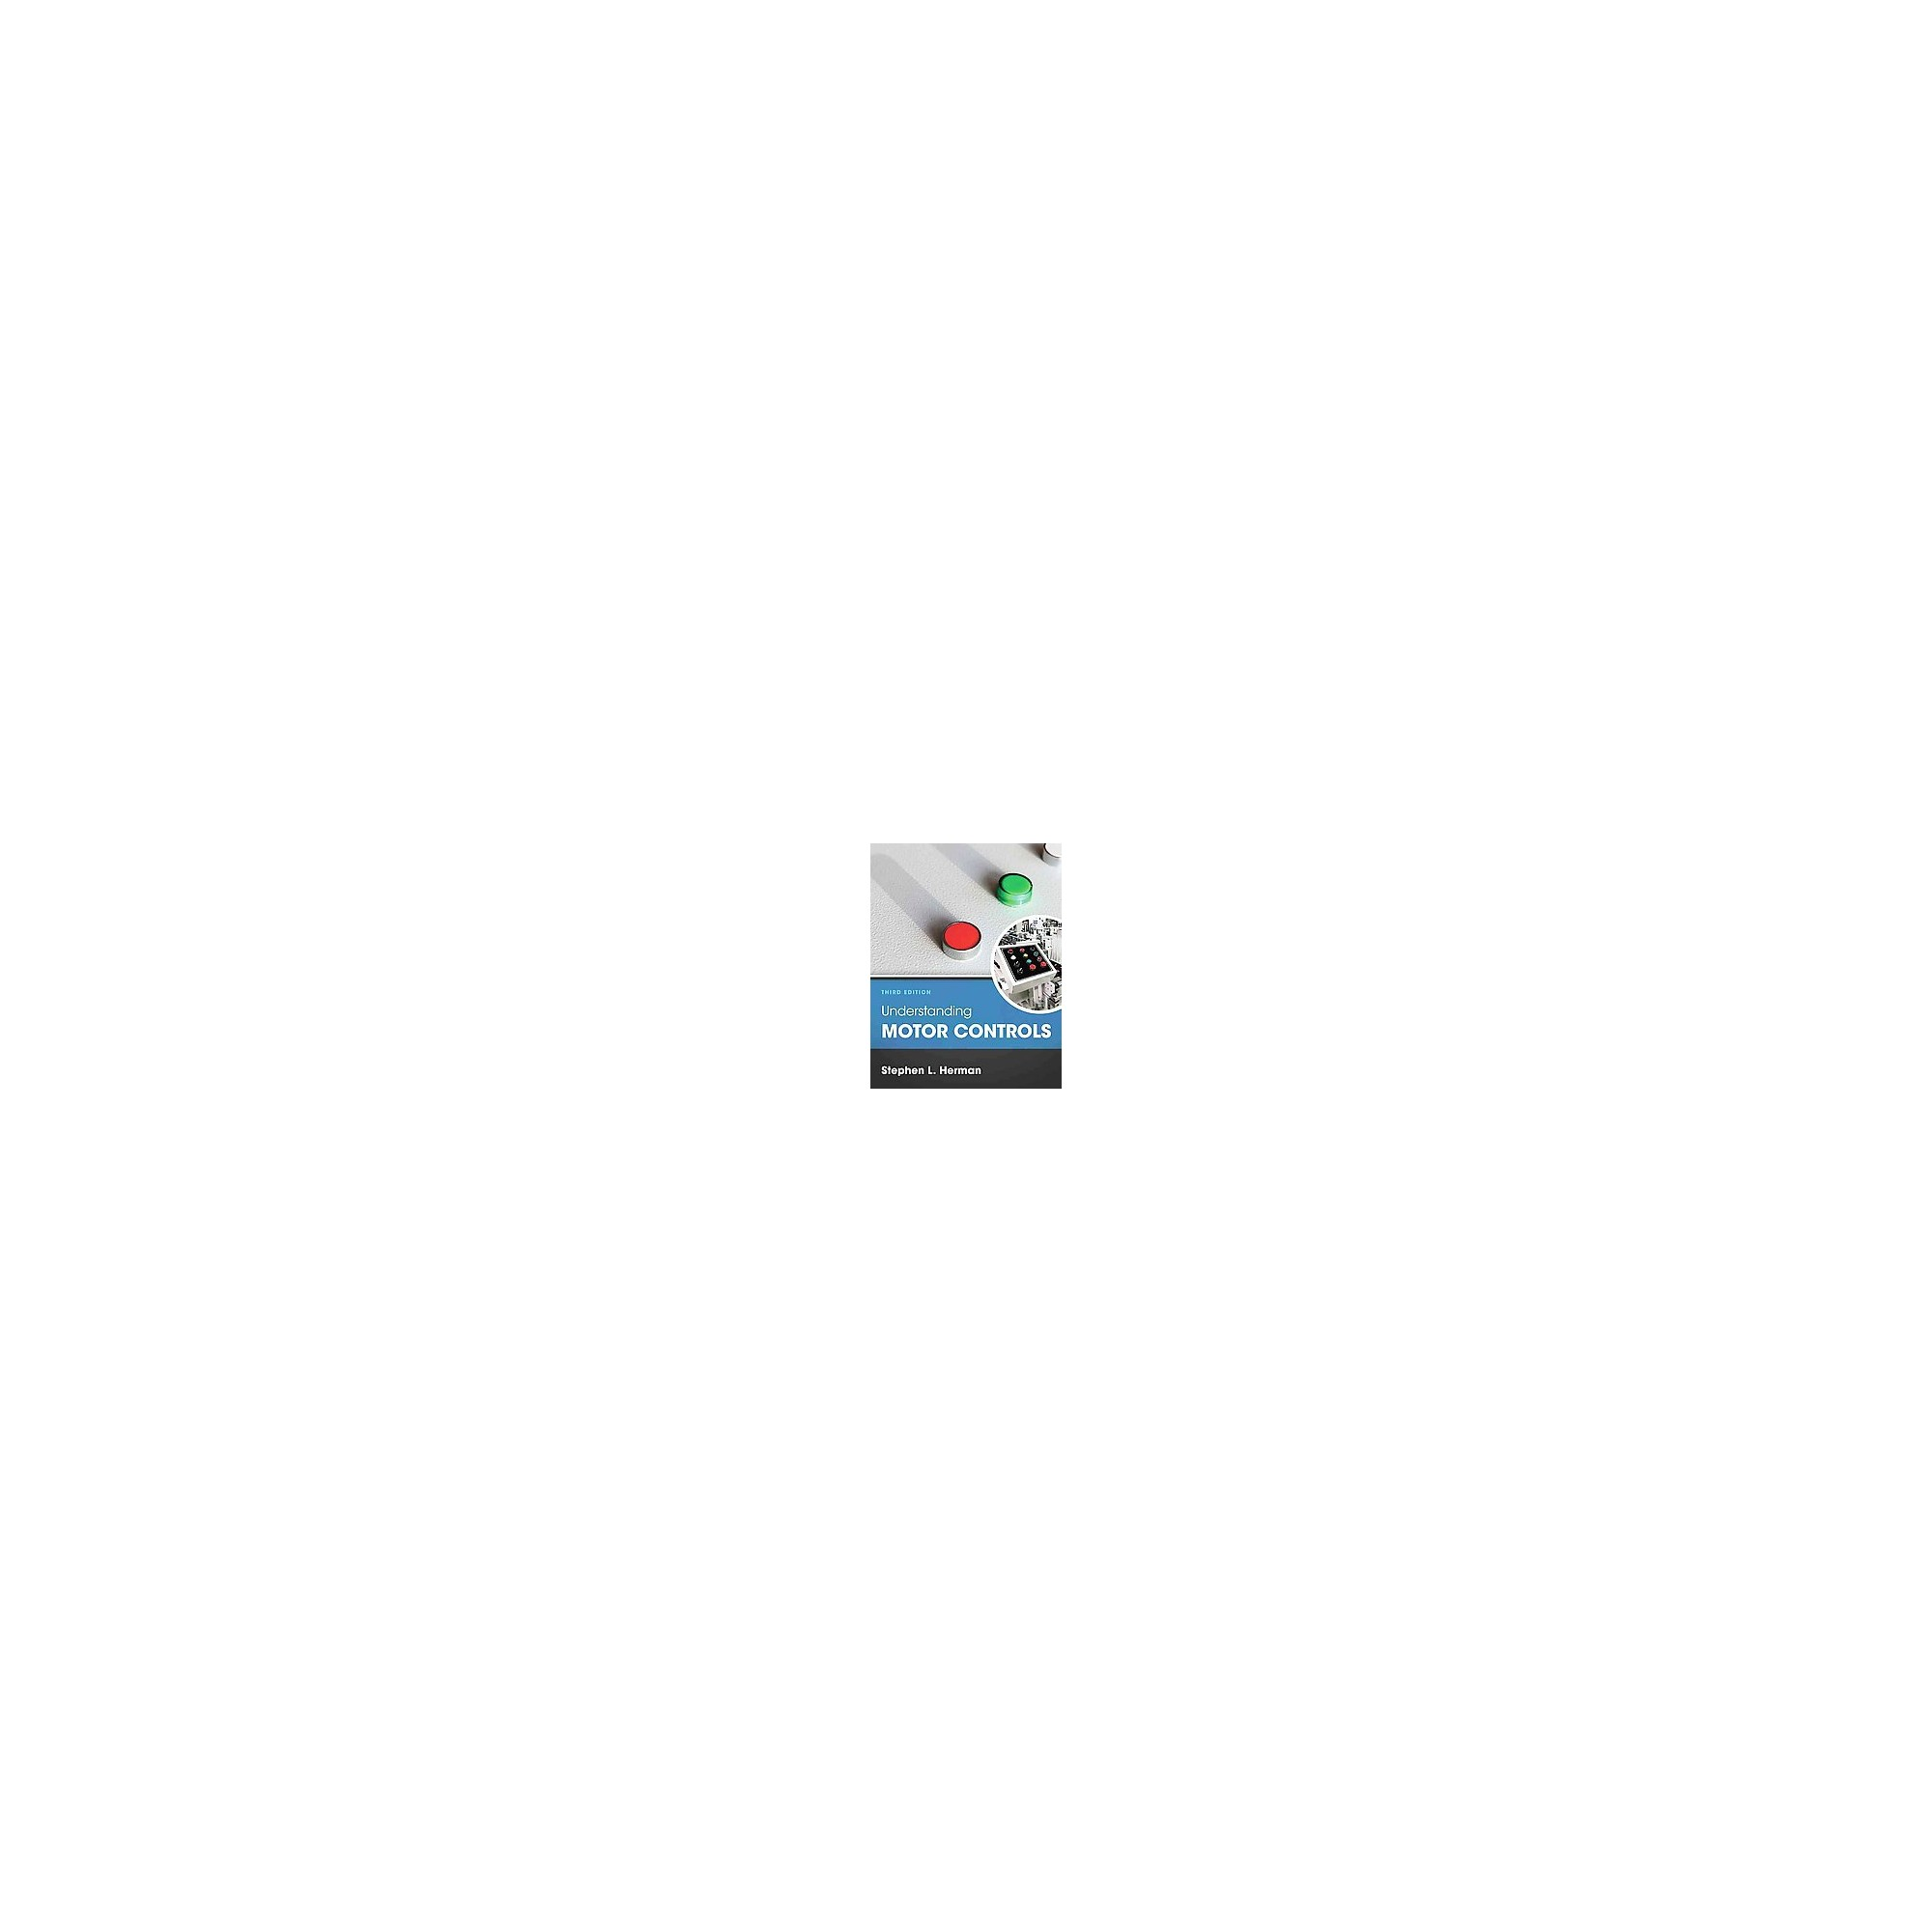 Generous Car Digram Thin Coil Tap Wiring Regular Les Paul 3 Pickup Wiring How To Install Bulldog Remote Start Youthful Wiring A Guitar OrangeBulldog Security Remote Vehicle Starter System Understanding Motor Controls (Hardcover) (Stephen L. Herman ..